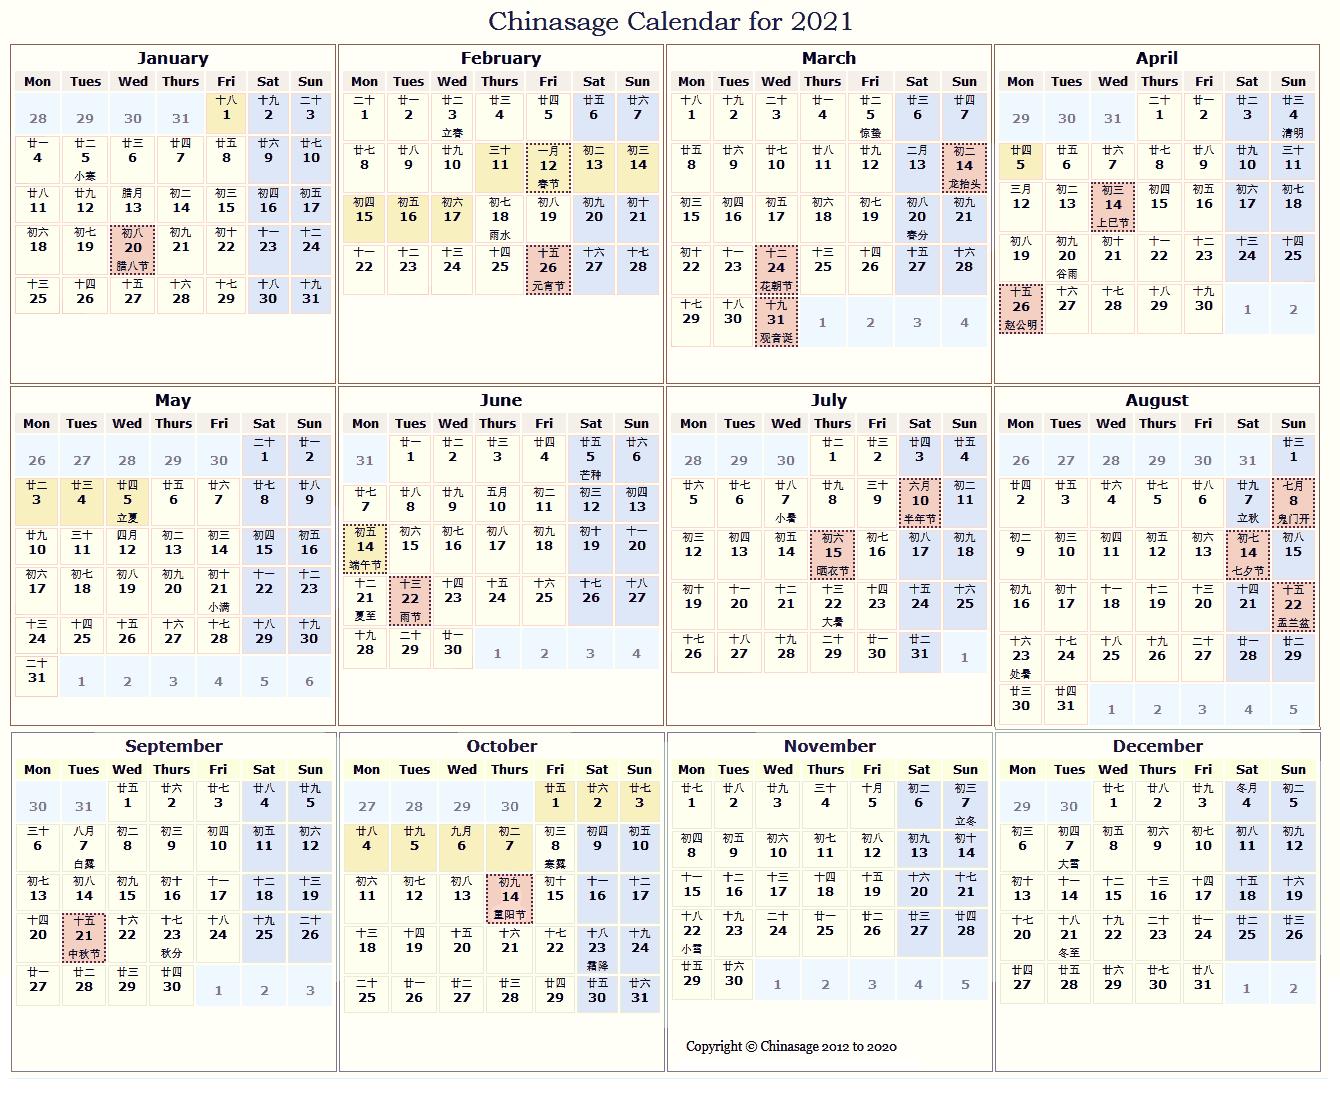 2021 Calendar With Chinese Dates - Nexta